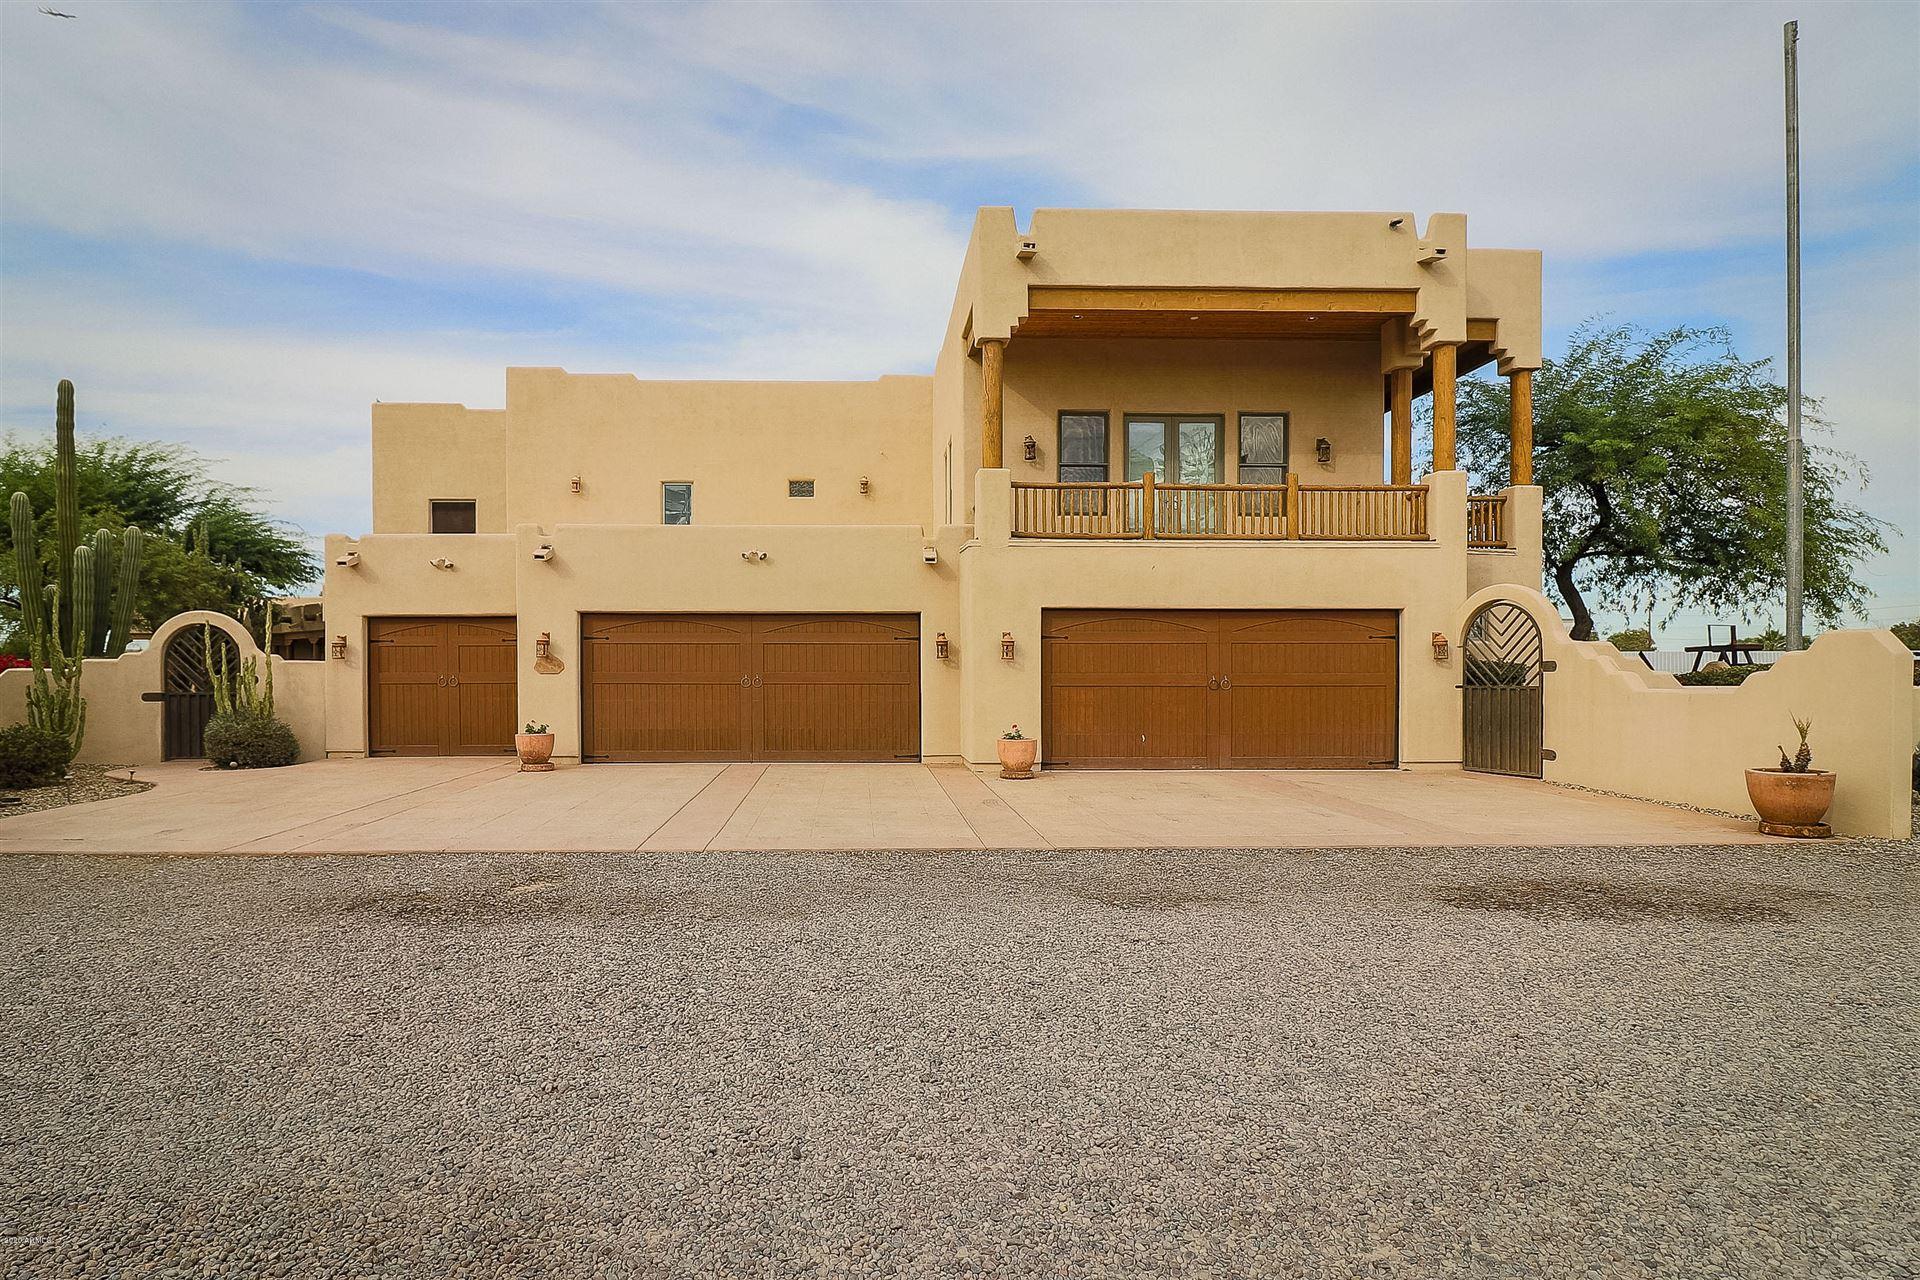 3835 S 67th Avenue, Phoenix, AZ 85043 - MLS#: 6158277